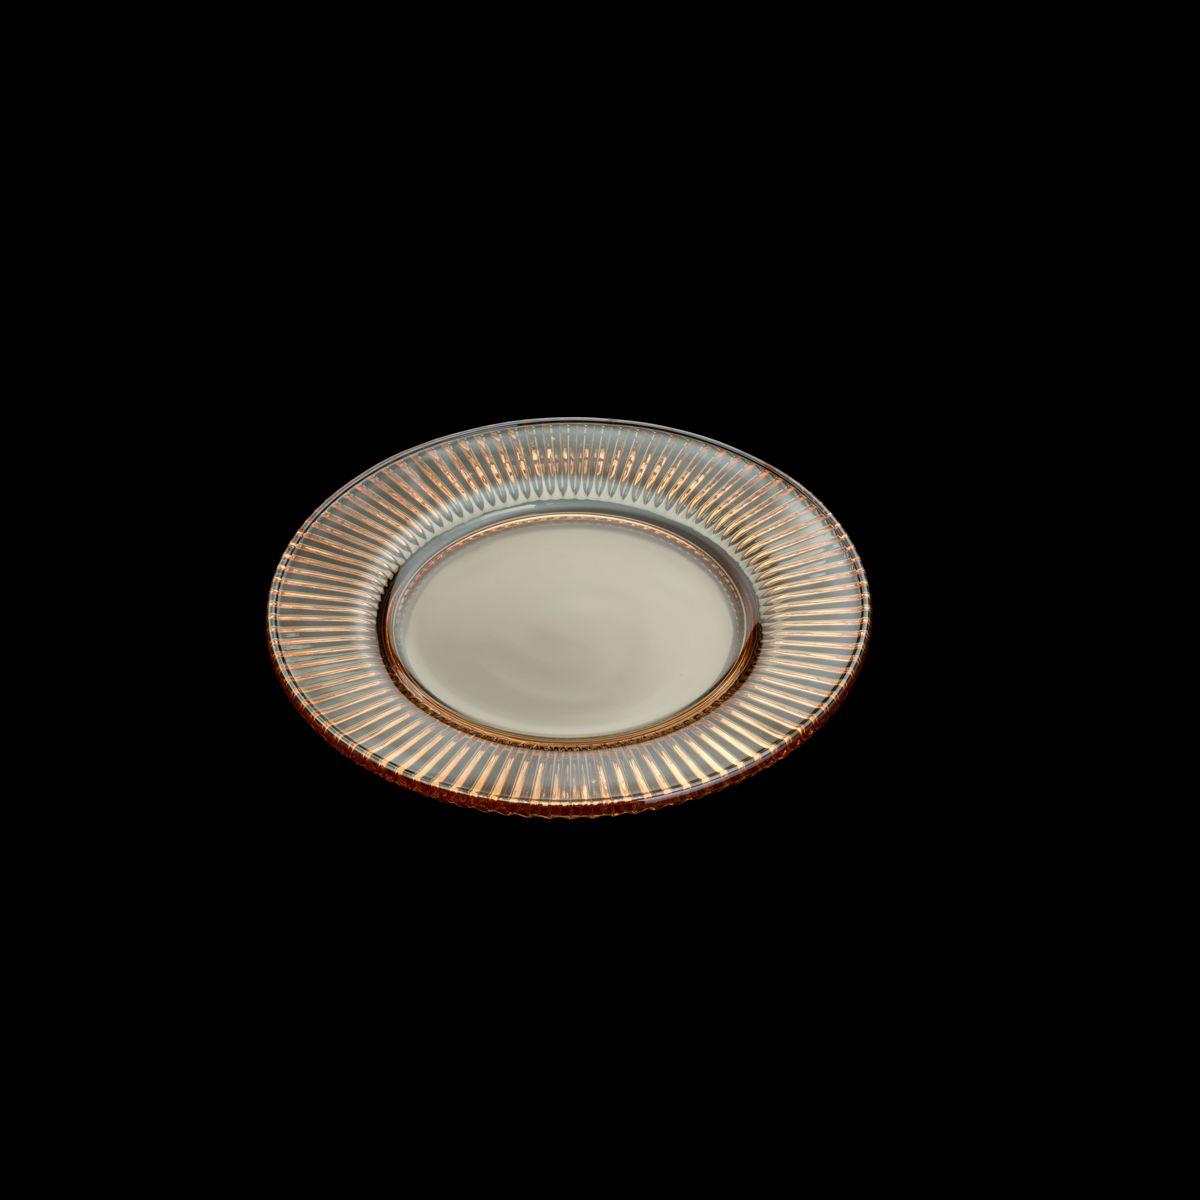 Prato 22,5 cm de cristal âmbar Renaissance Lyor - L7495